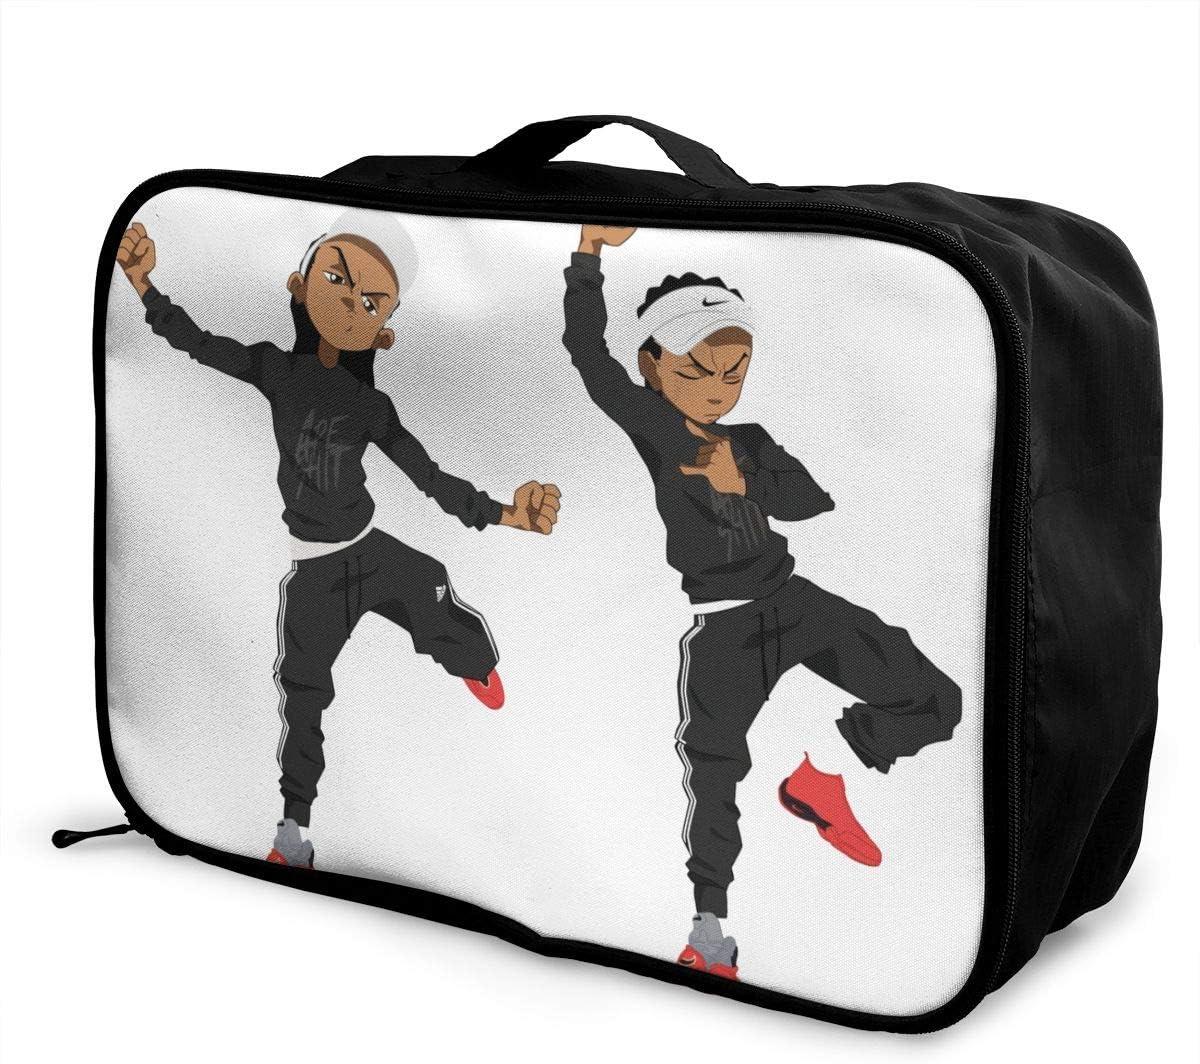 The Boondocks Lightweight Large Capacity Portable Luggage Bag Hanging Organizer Bag Makeup Bag